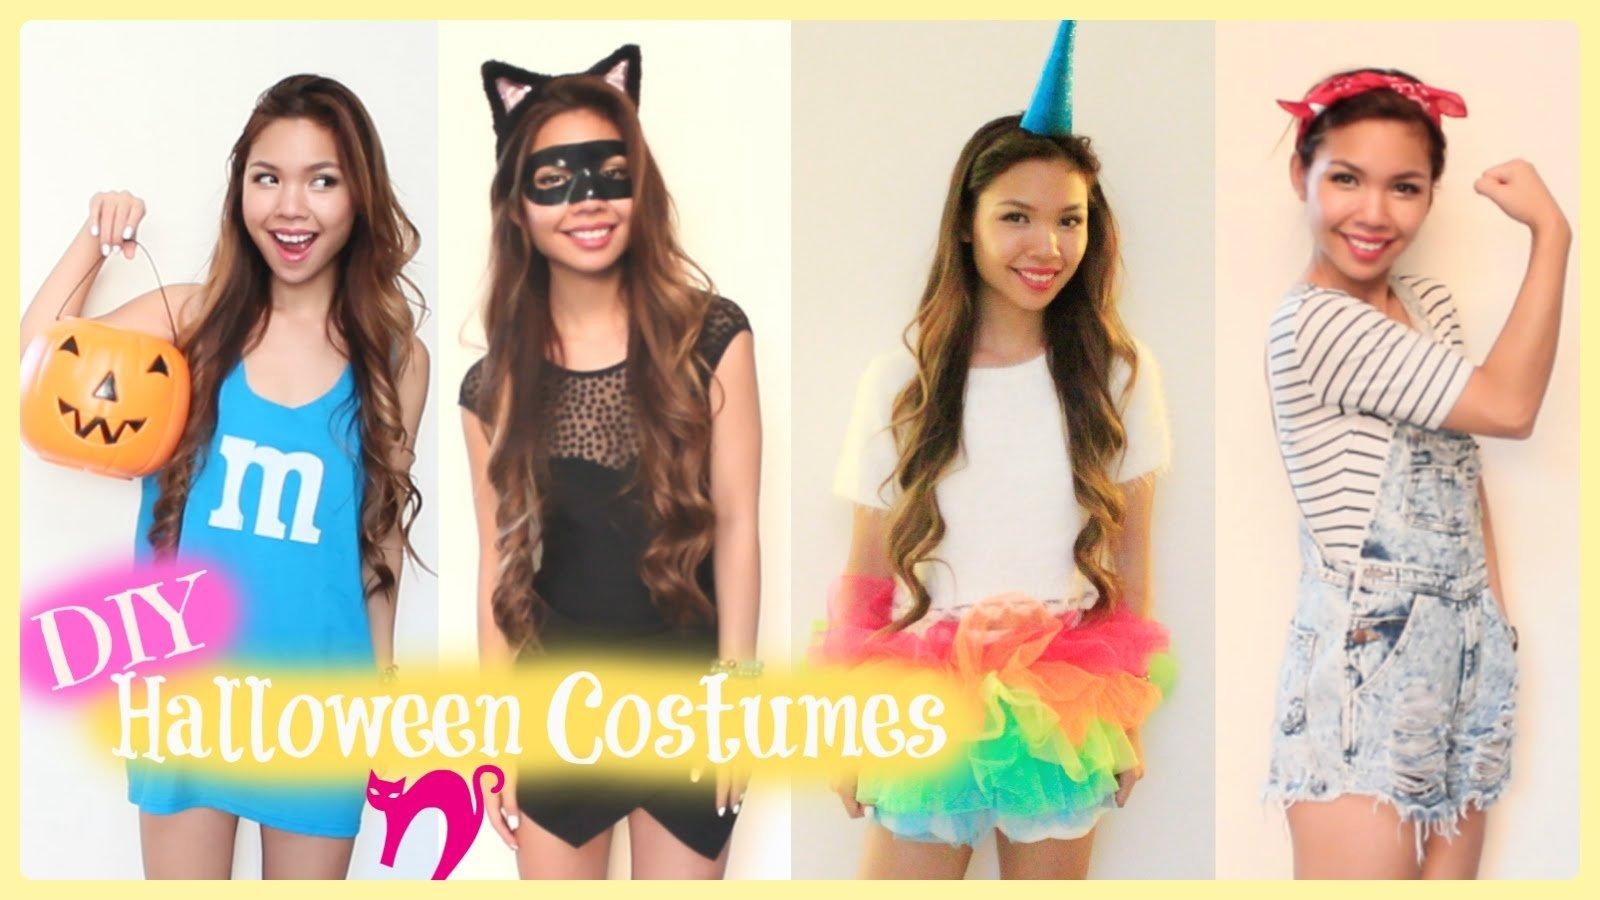 10 Nice Last Minute Halloween Costume Ideas Women super easy last minute diy halloween costumes 2014 youtube 8 2021